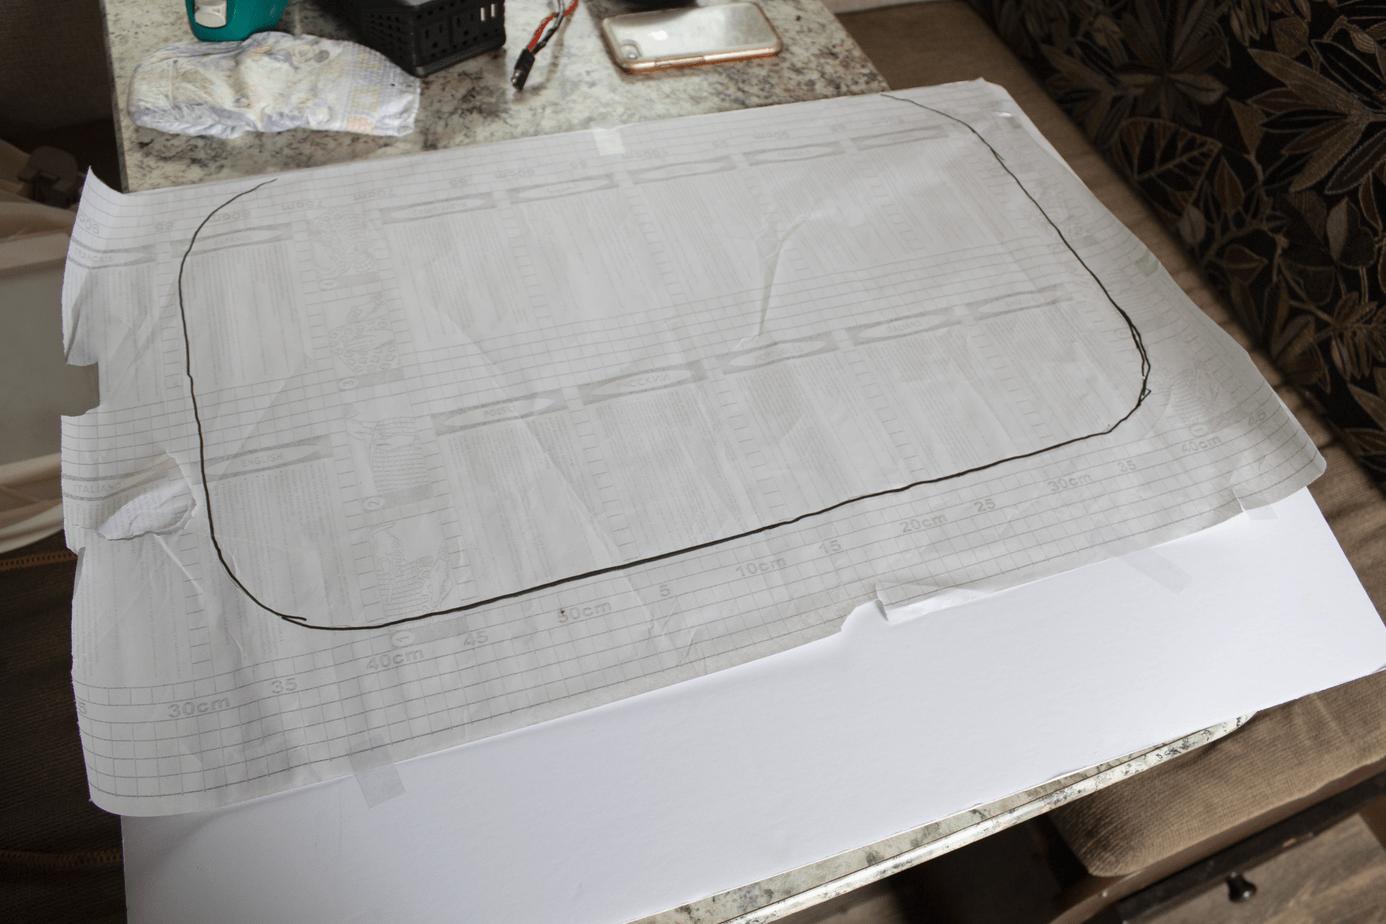 tape rv window cover outline to foam board